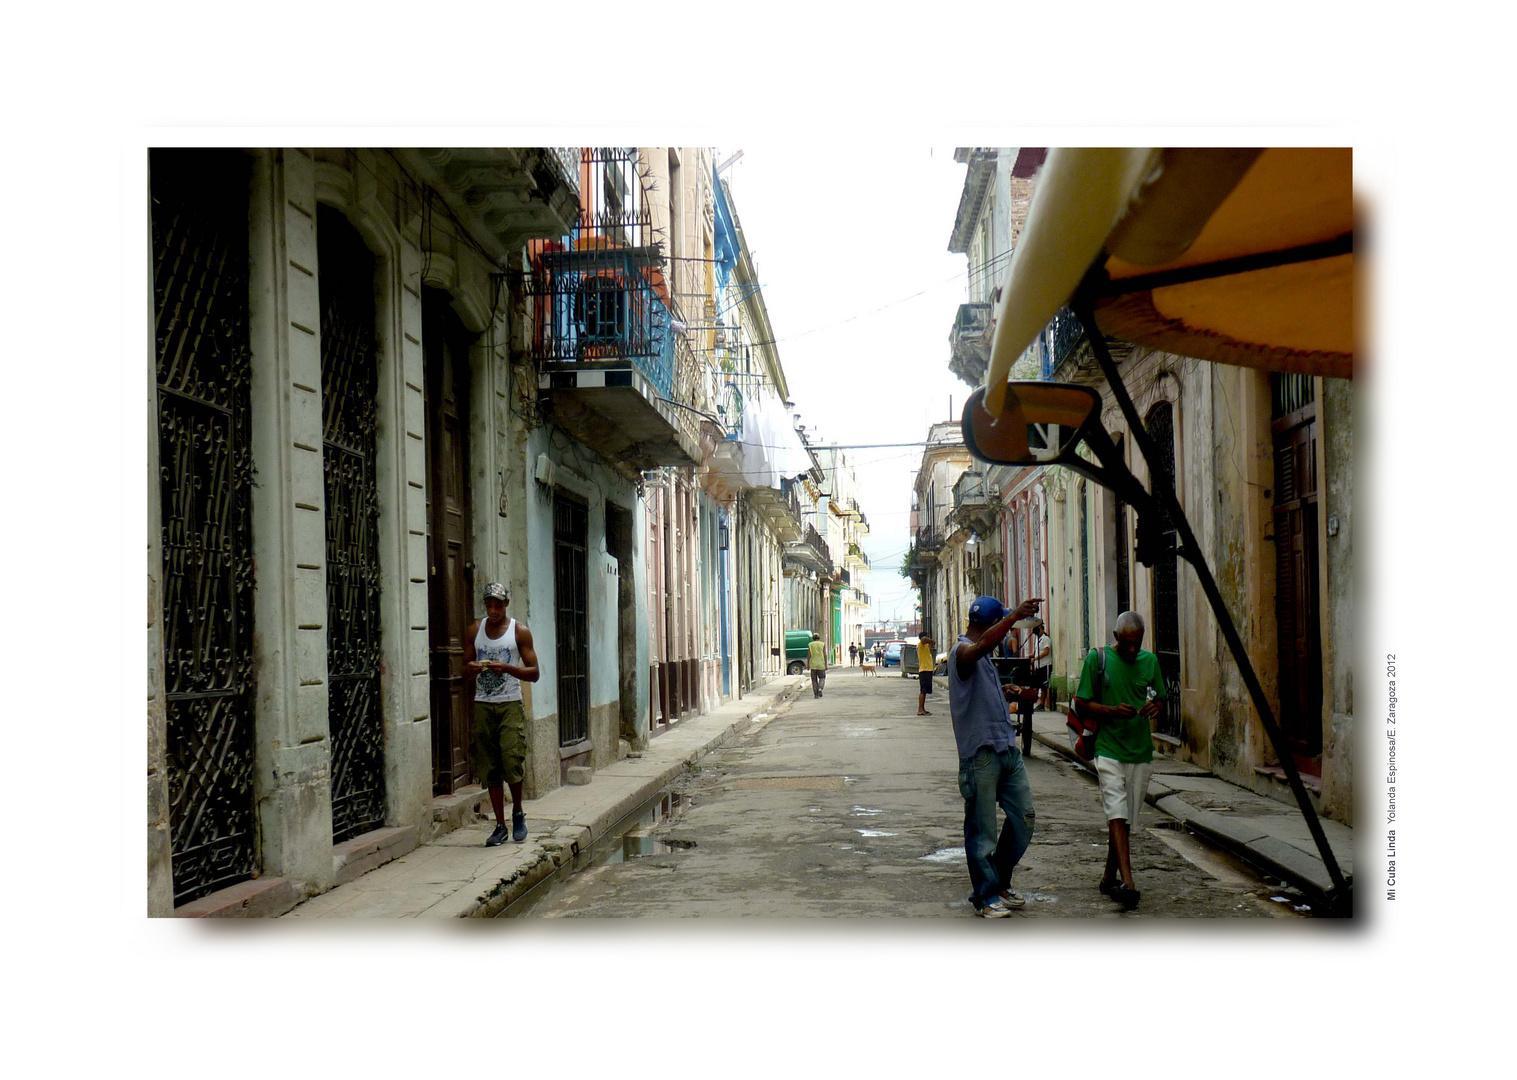 Por la calles de la Habana vieja, Cuba